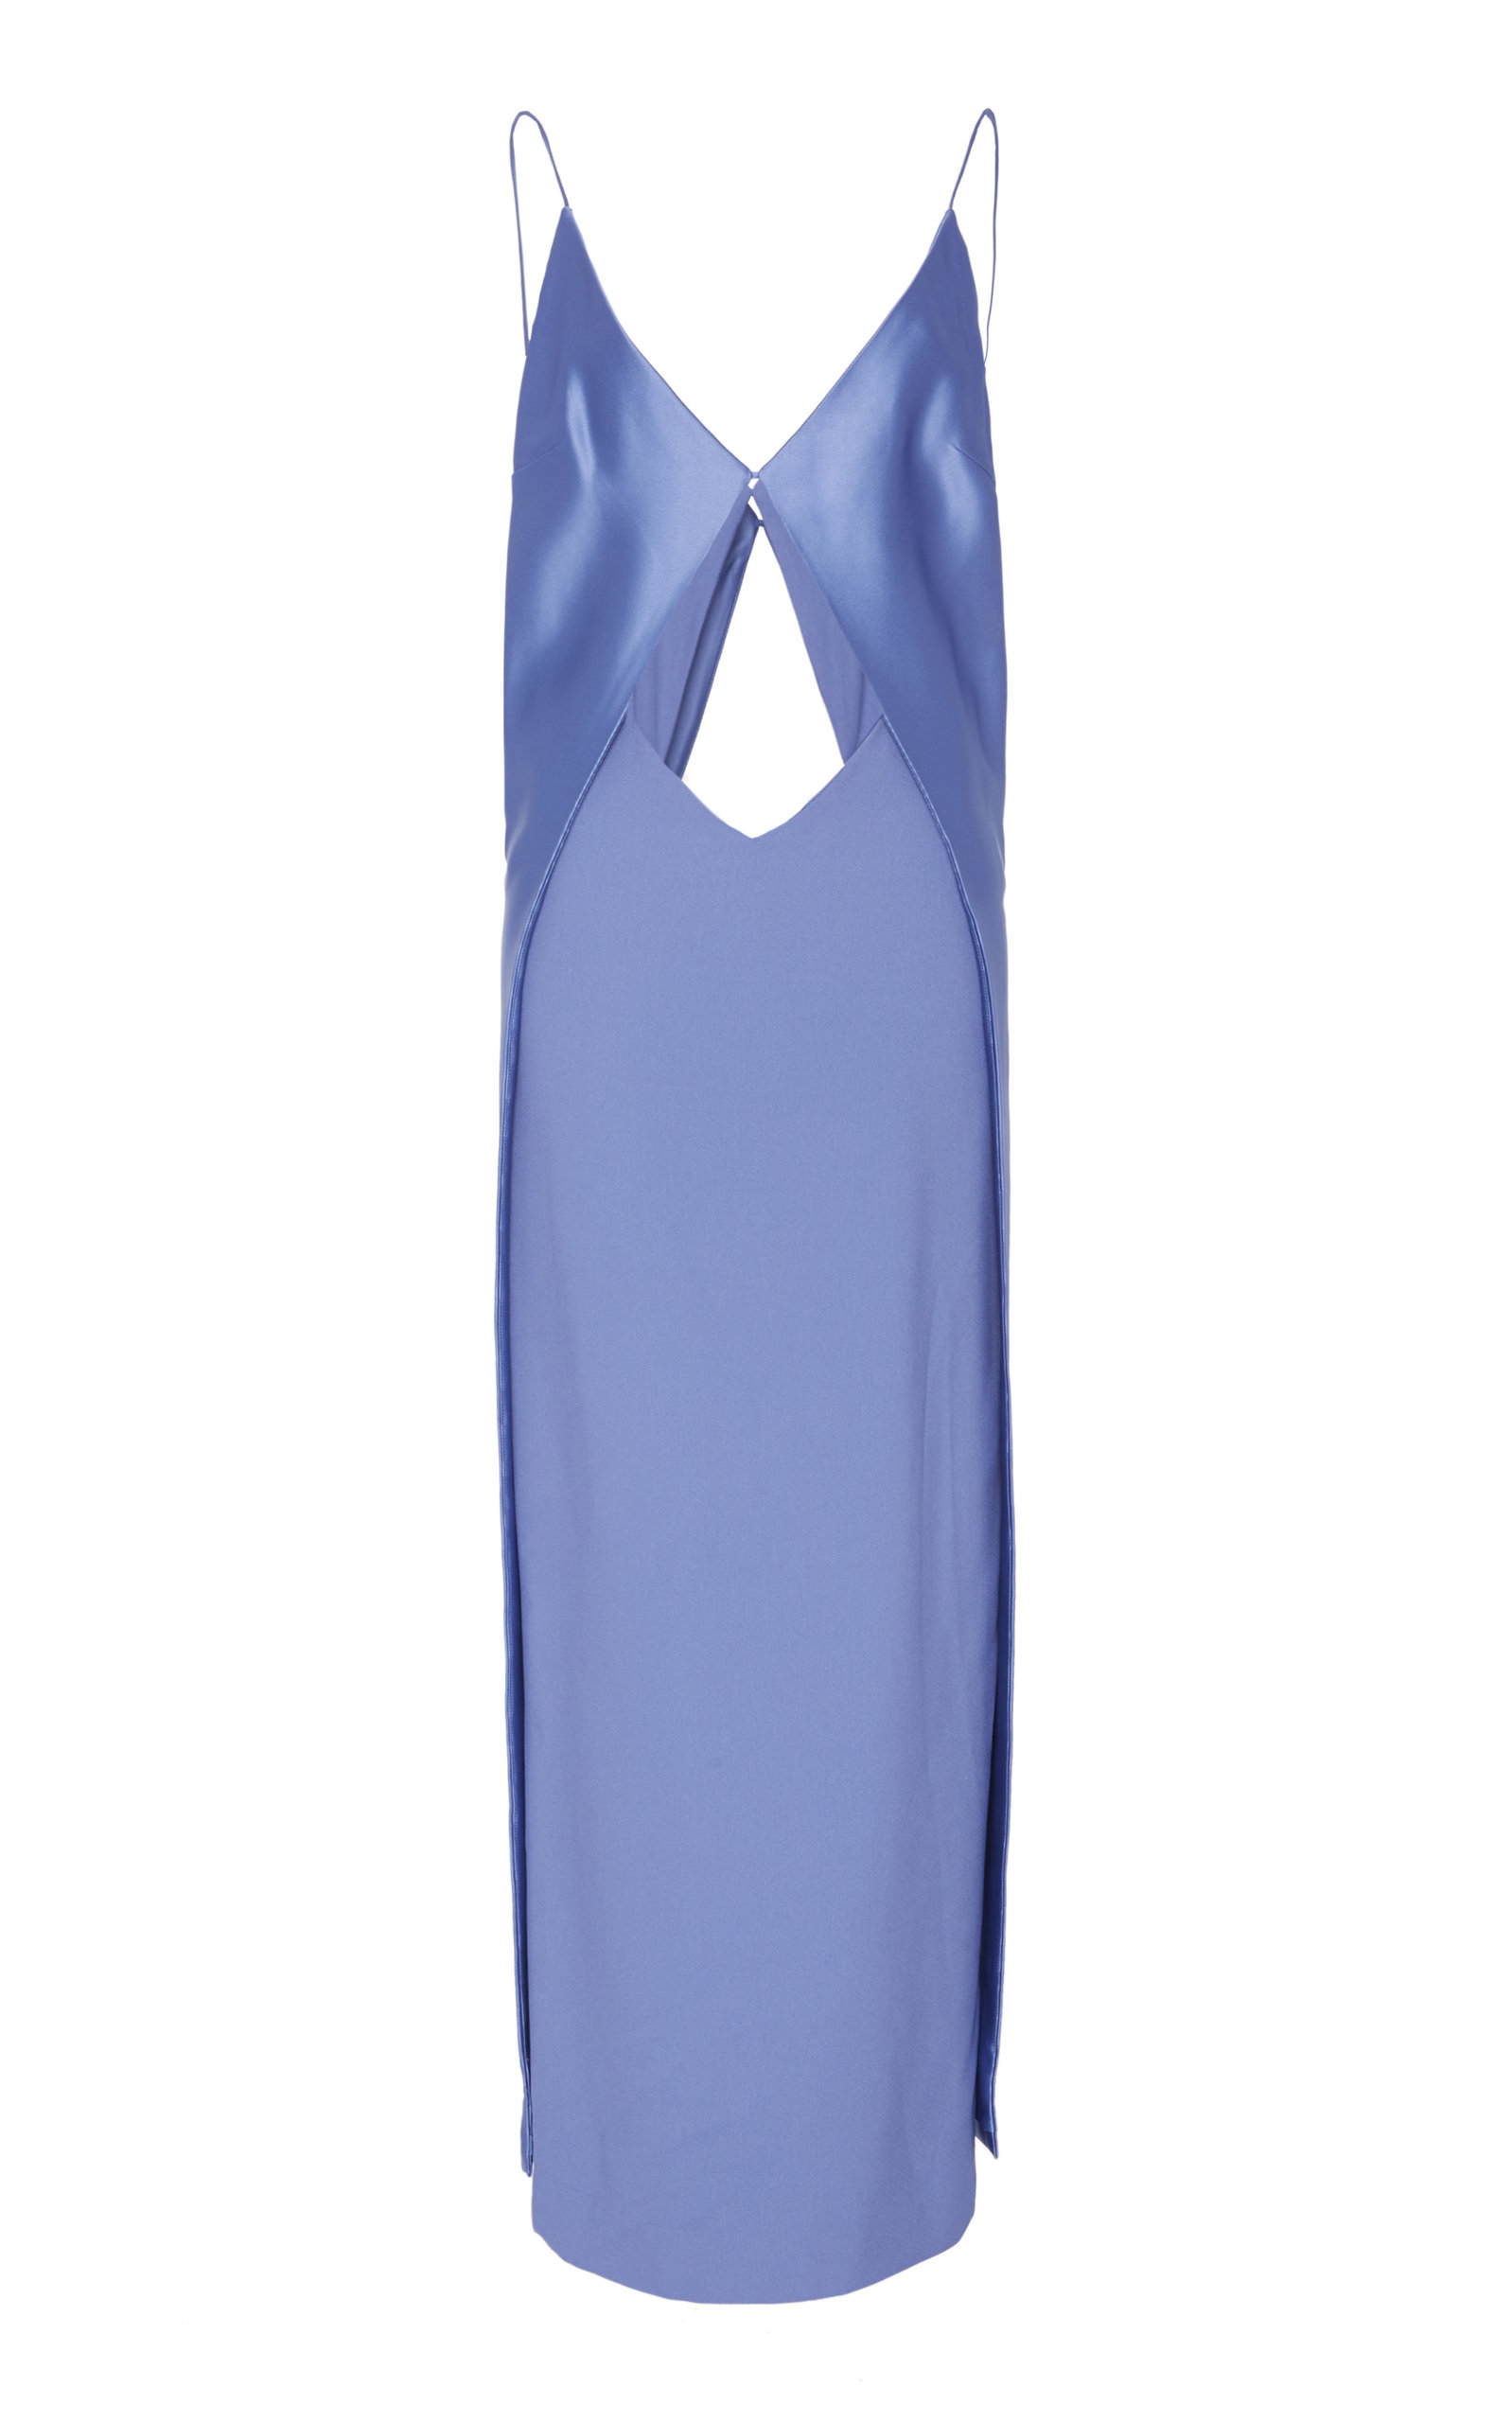 TESSELLATE CAMI DRESS